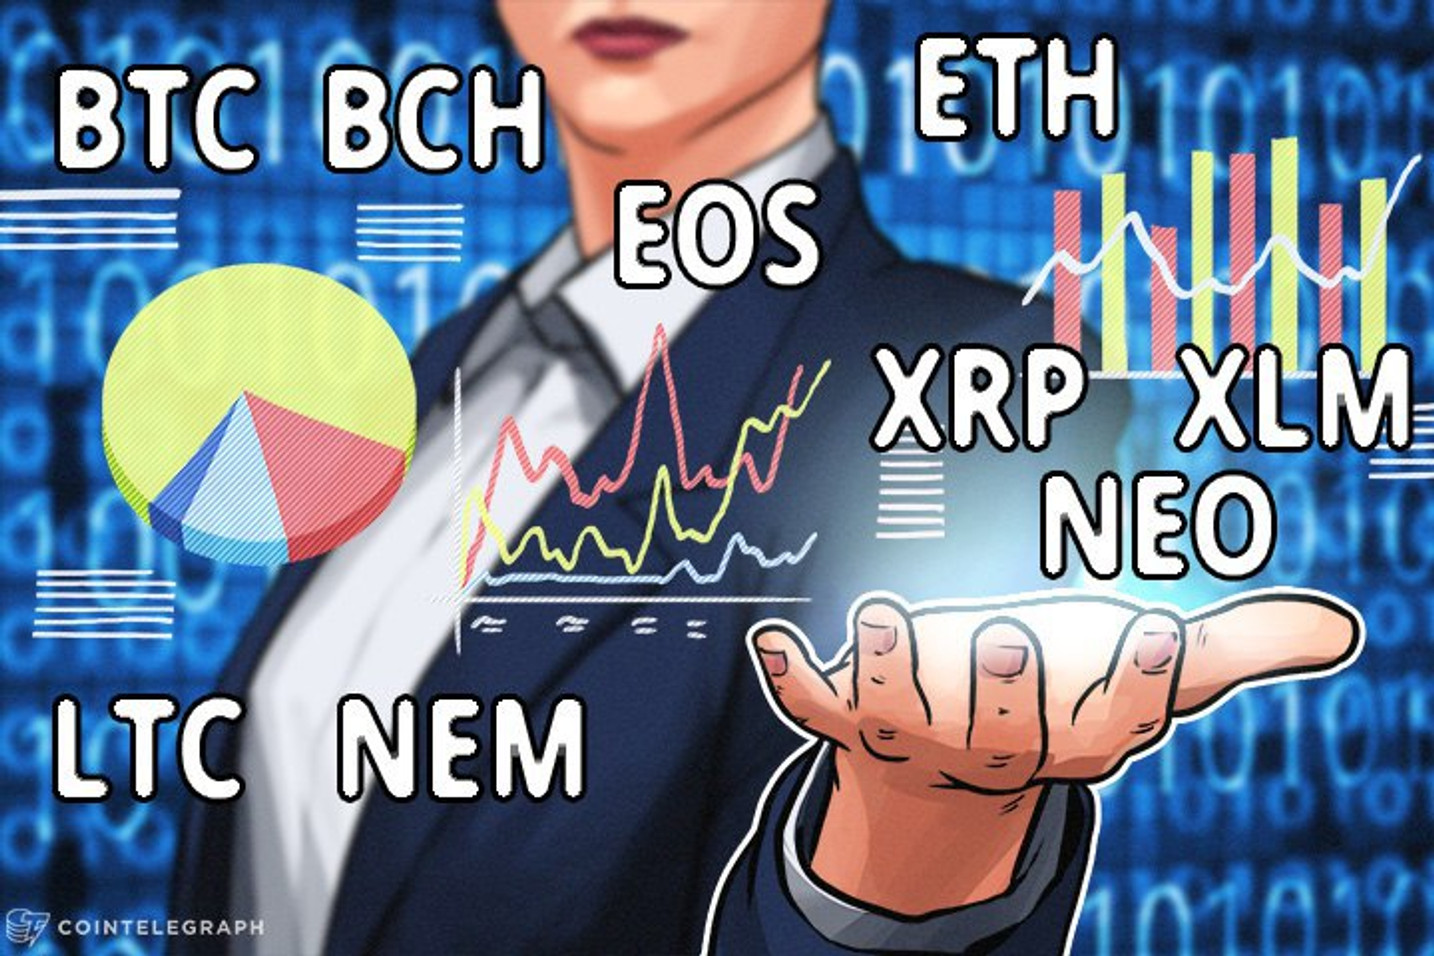 Análise de Preços, 7 de Fevereiro: Bitcoin, Ethereum, Bitcoin Cash, Ripple, Stellar, Litecoin, NEM, NEO e EO